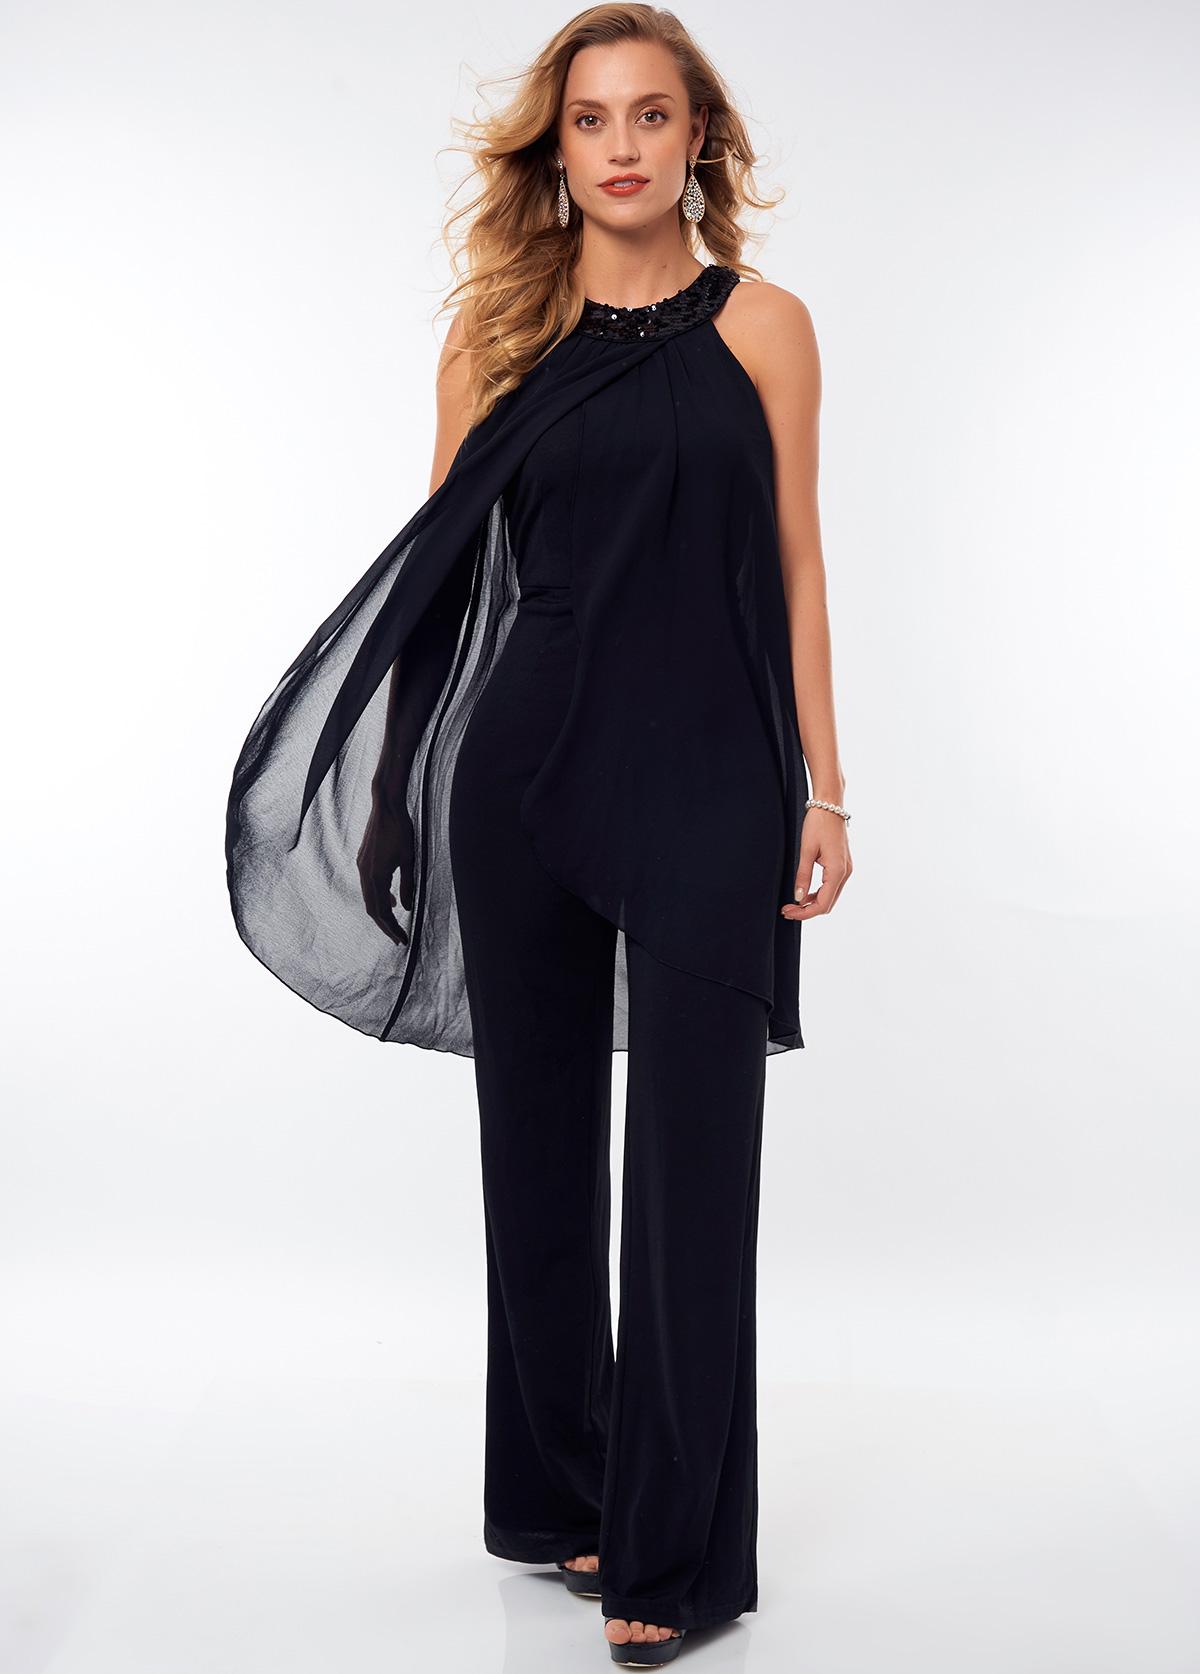 ROTITA Sequin Bib Neck Solid Sleeveless Jumpsuit